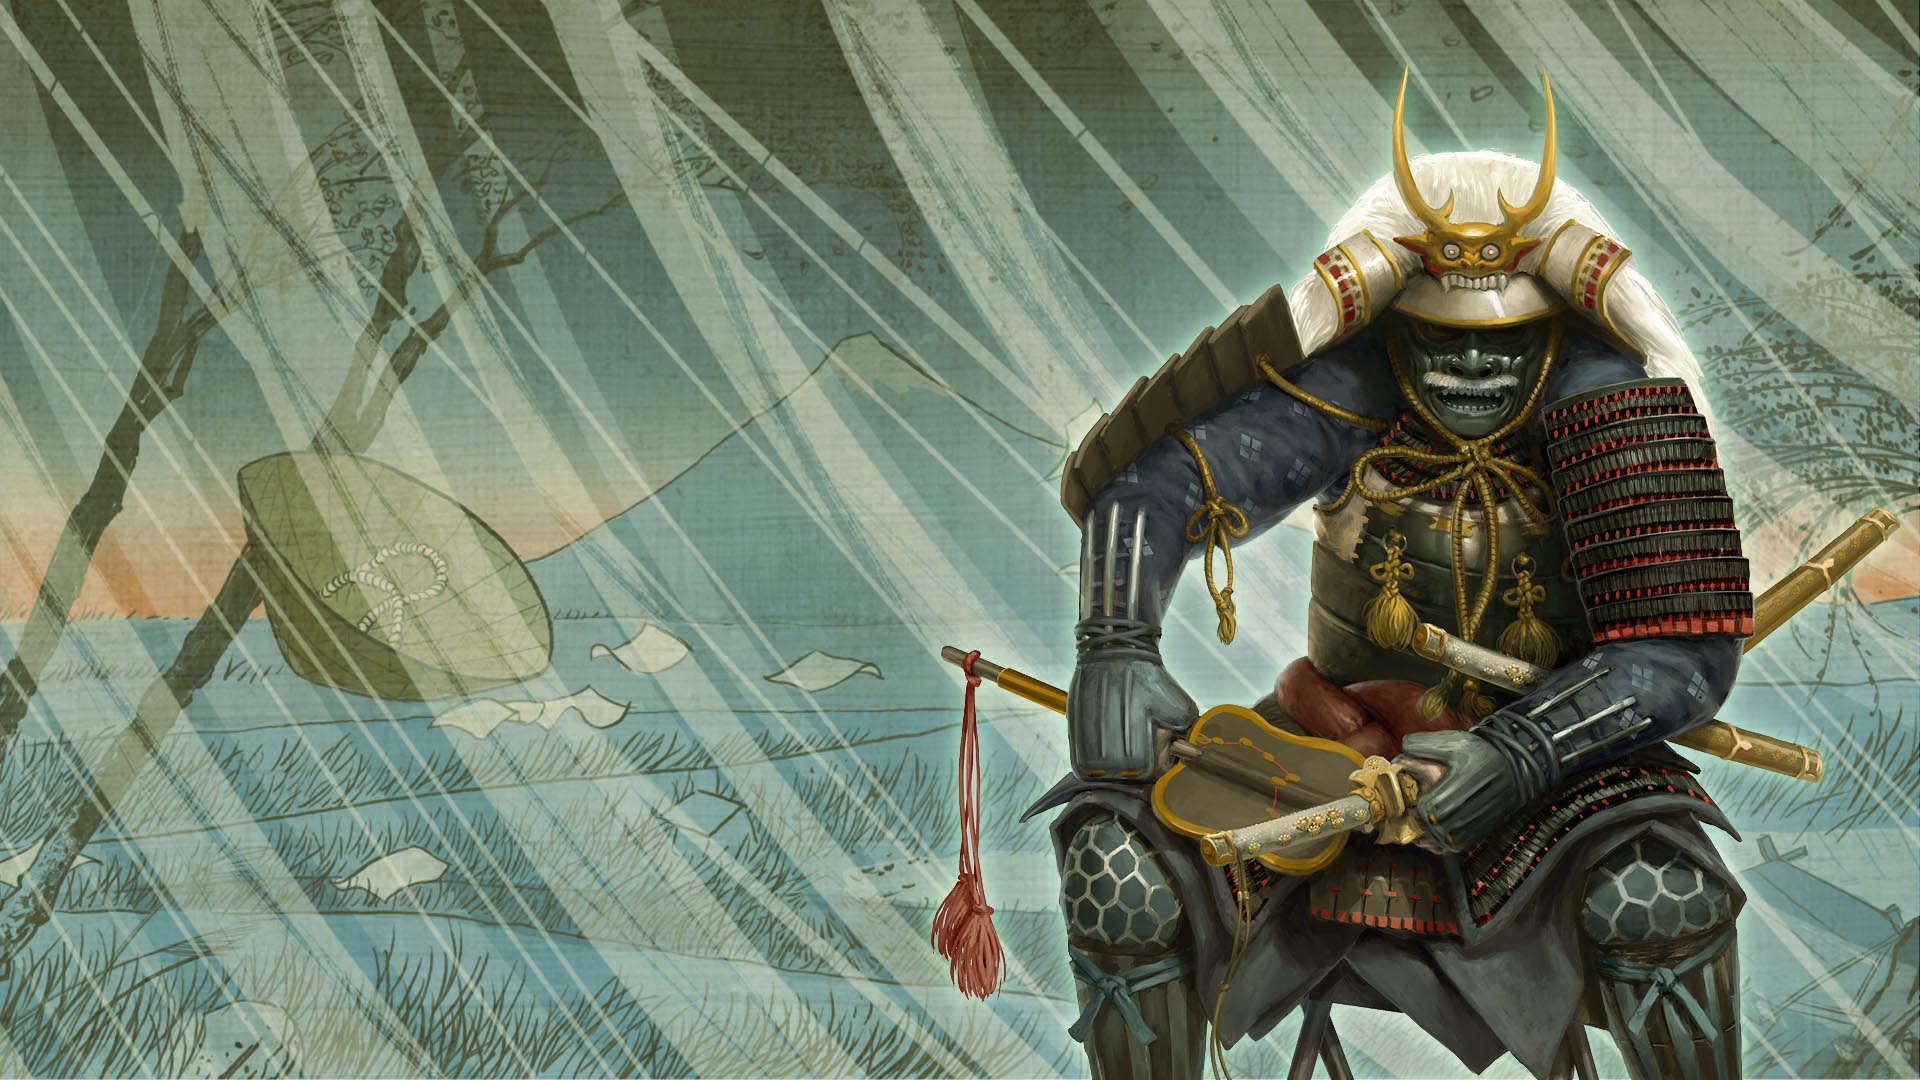 Shogun 2 Fall Of The Samurai Wallpaper I M A Ninja It S Your Birthday Let S Play Total War